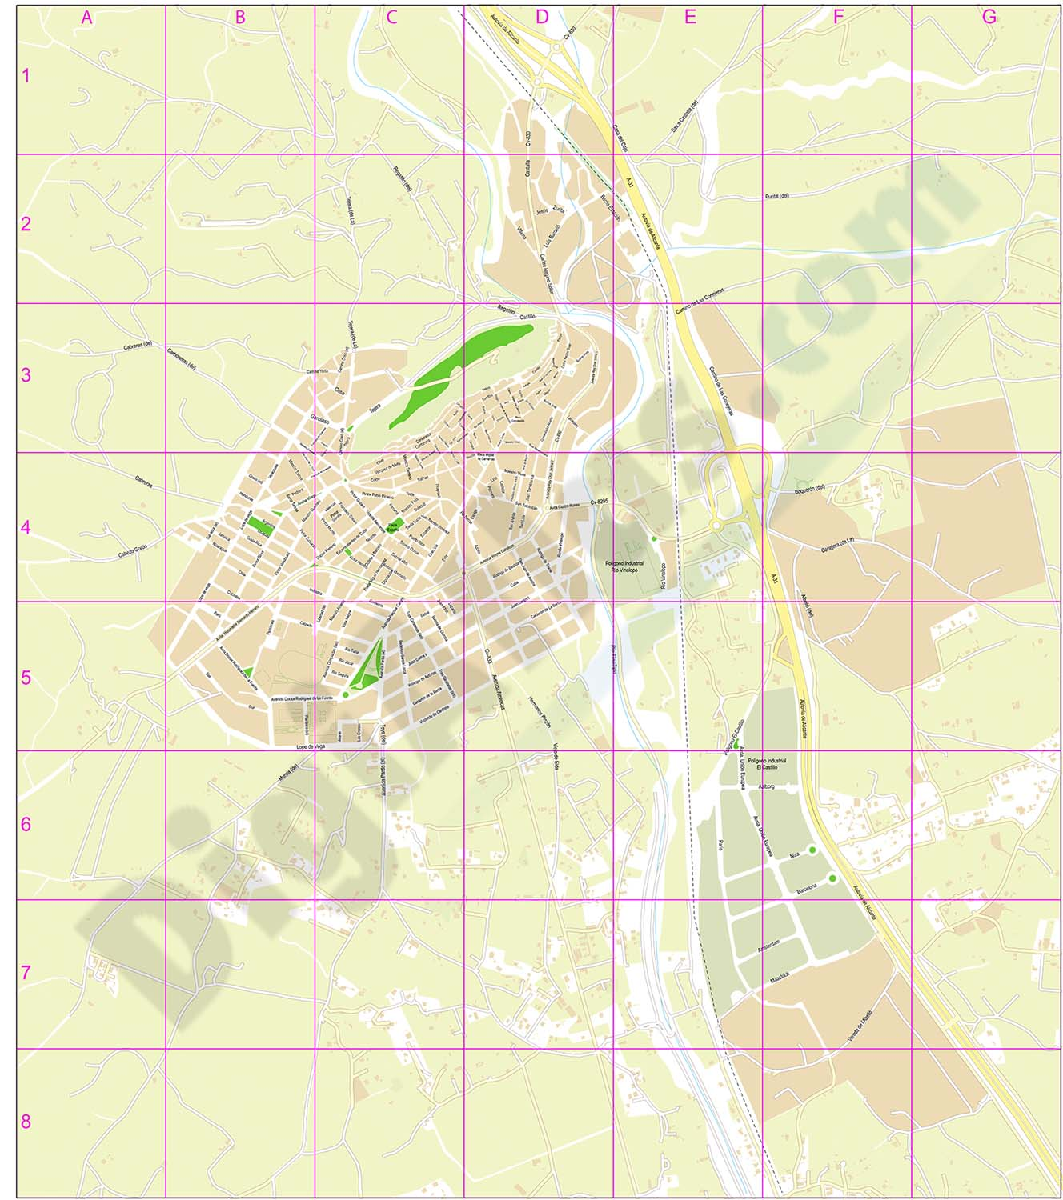 Sax - city map